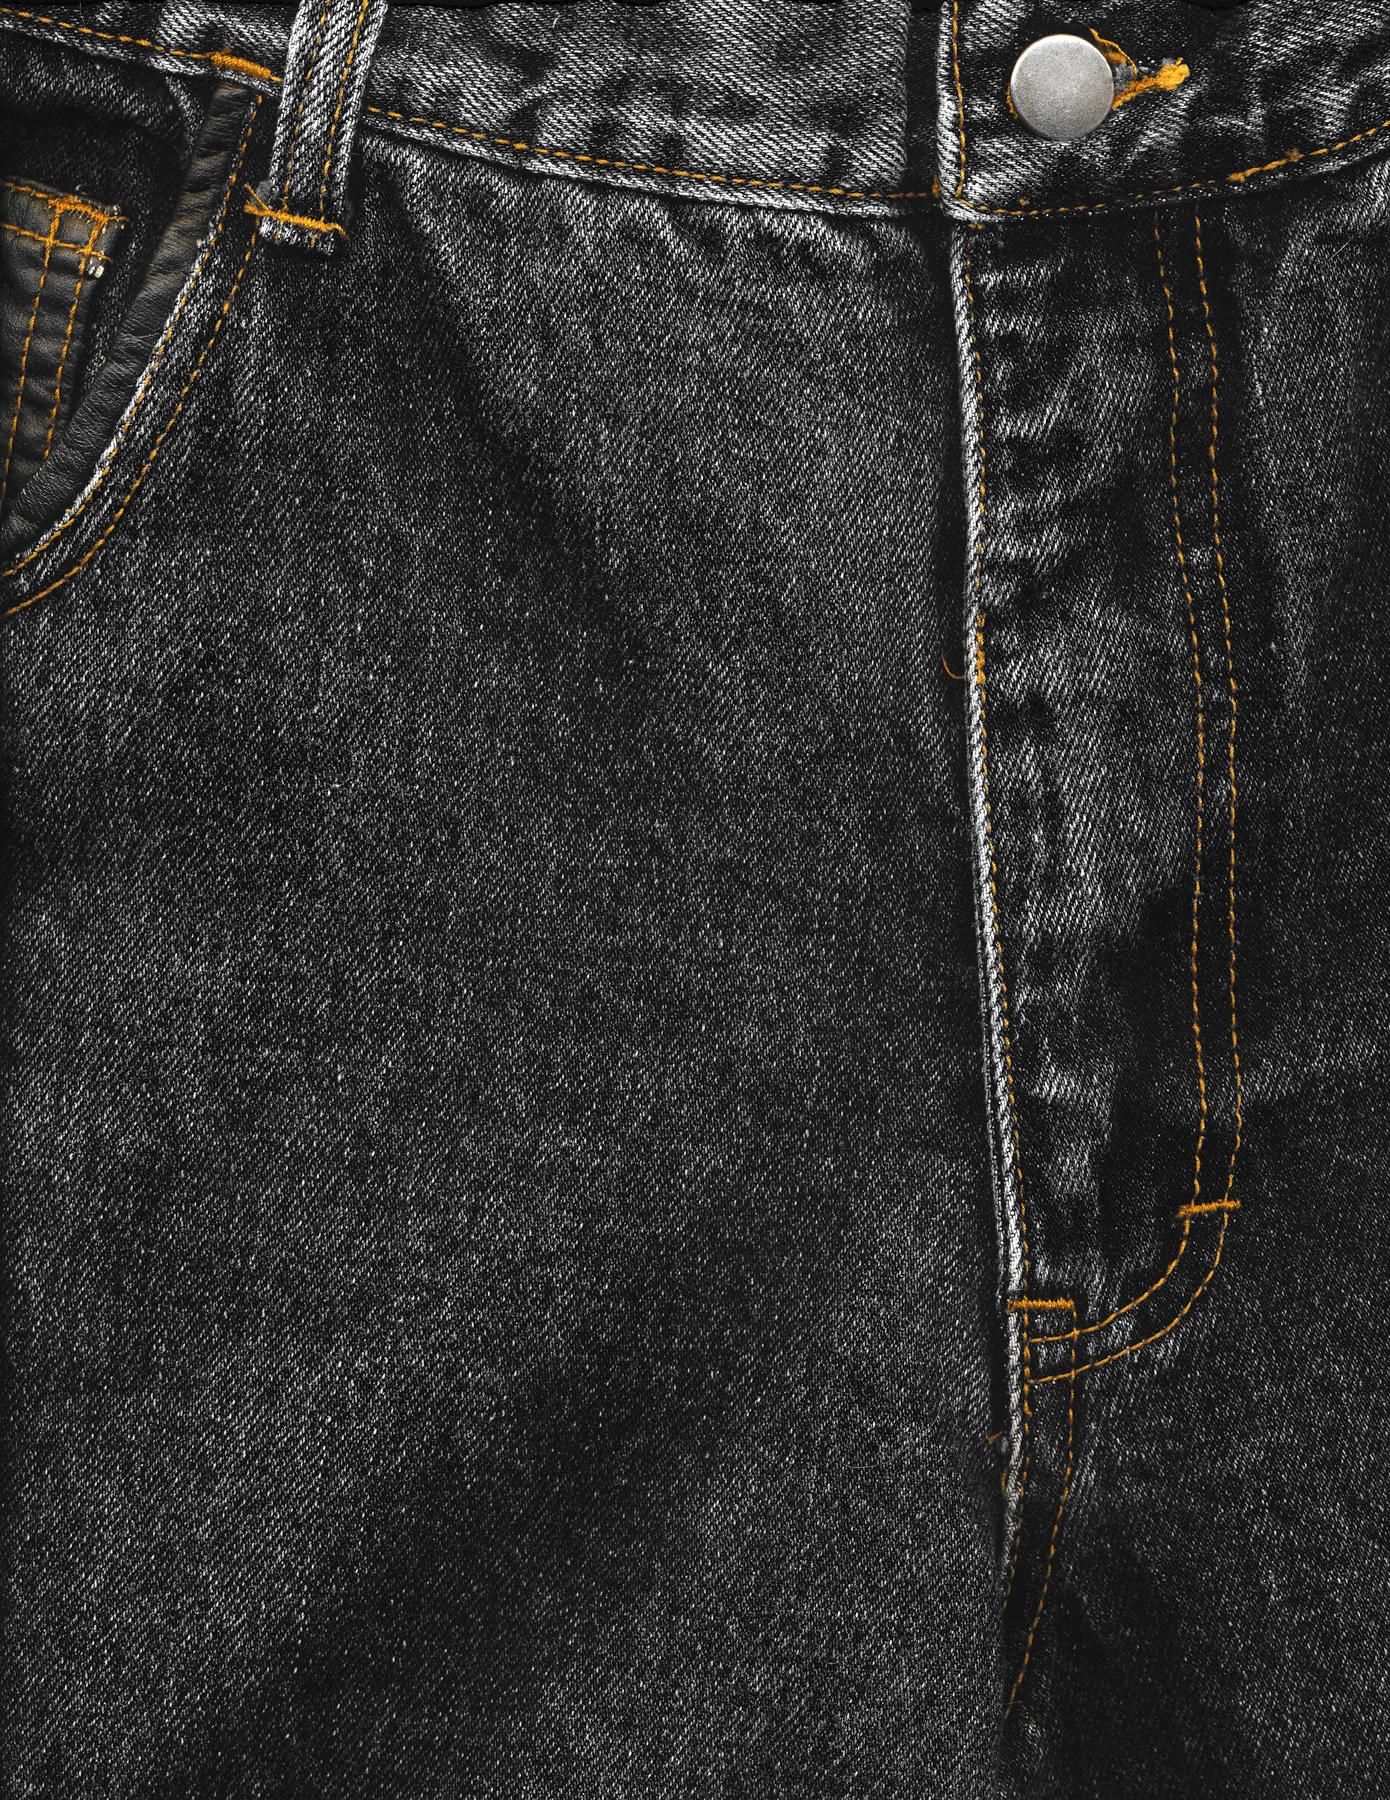 Black Jeans Texture, Seam, Resource, Seams, Stitch, HQ Photo